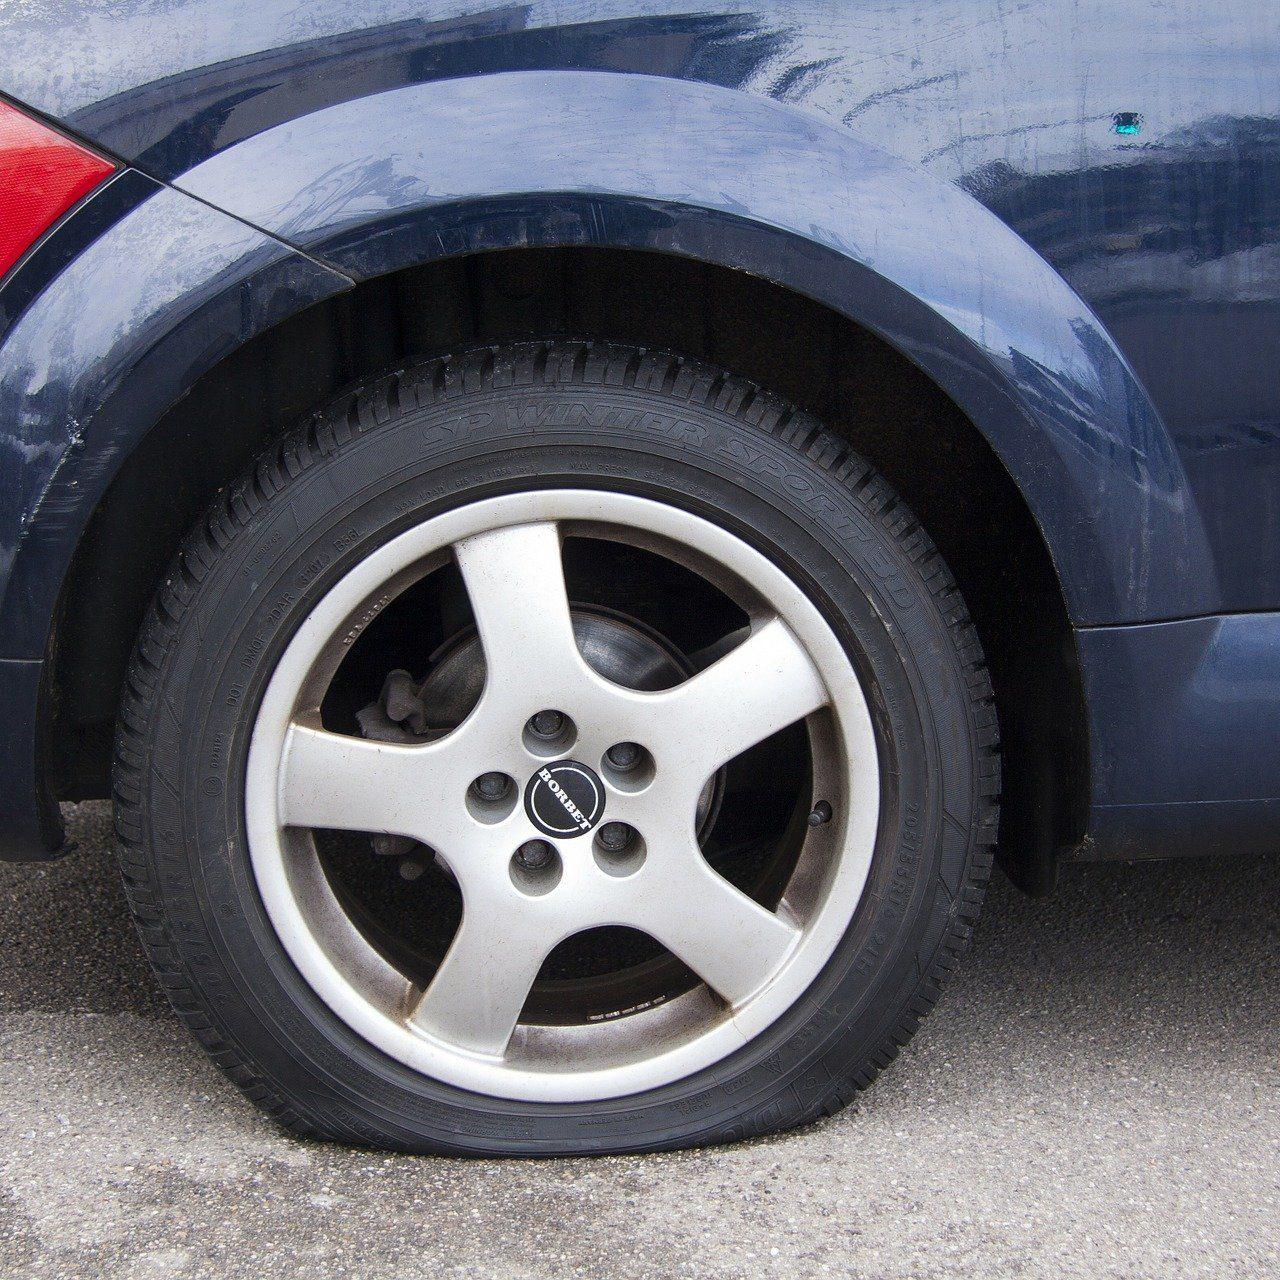 Dépannage Crevaison Pneu - Changement de pneu